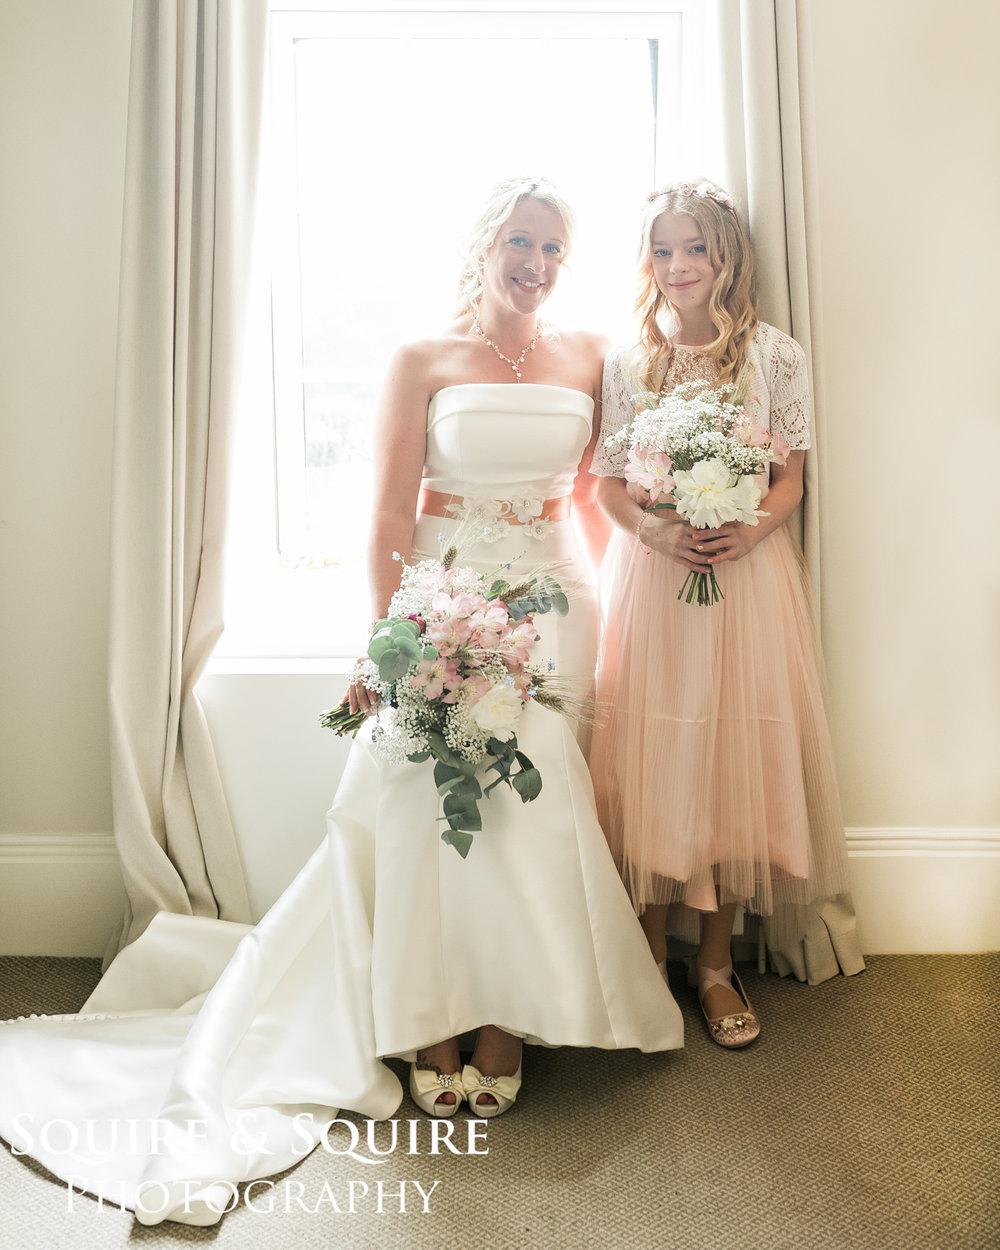 wedding_photography_catthorpe Manor (16 of 66).jpg